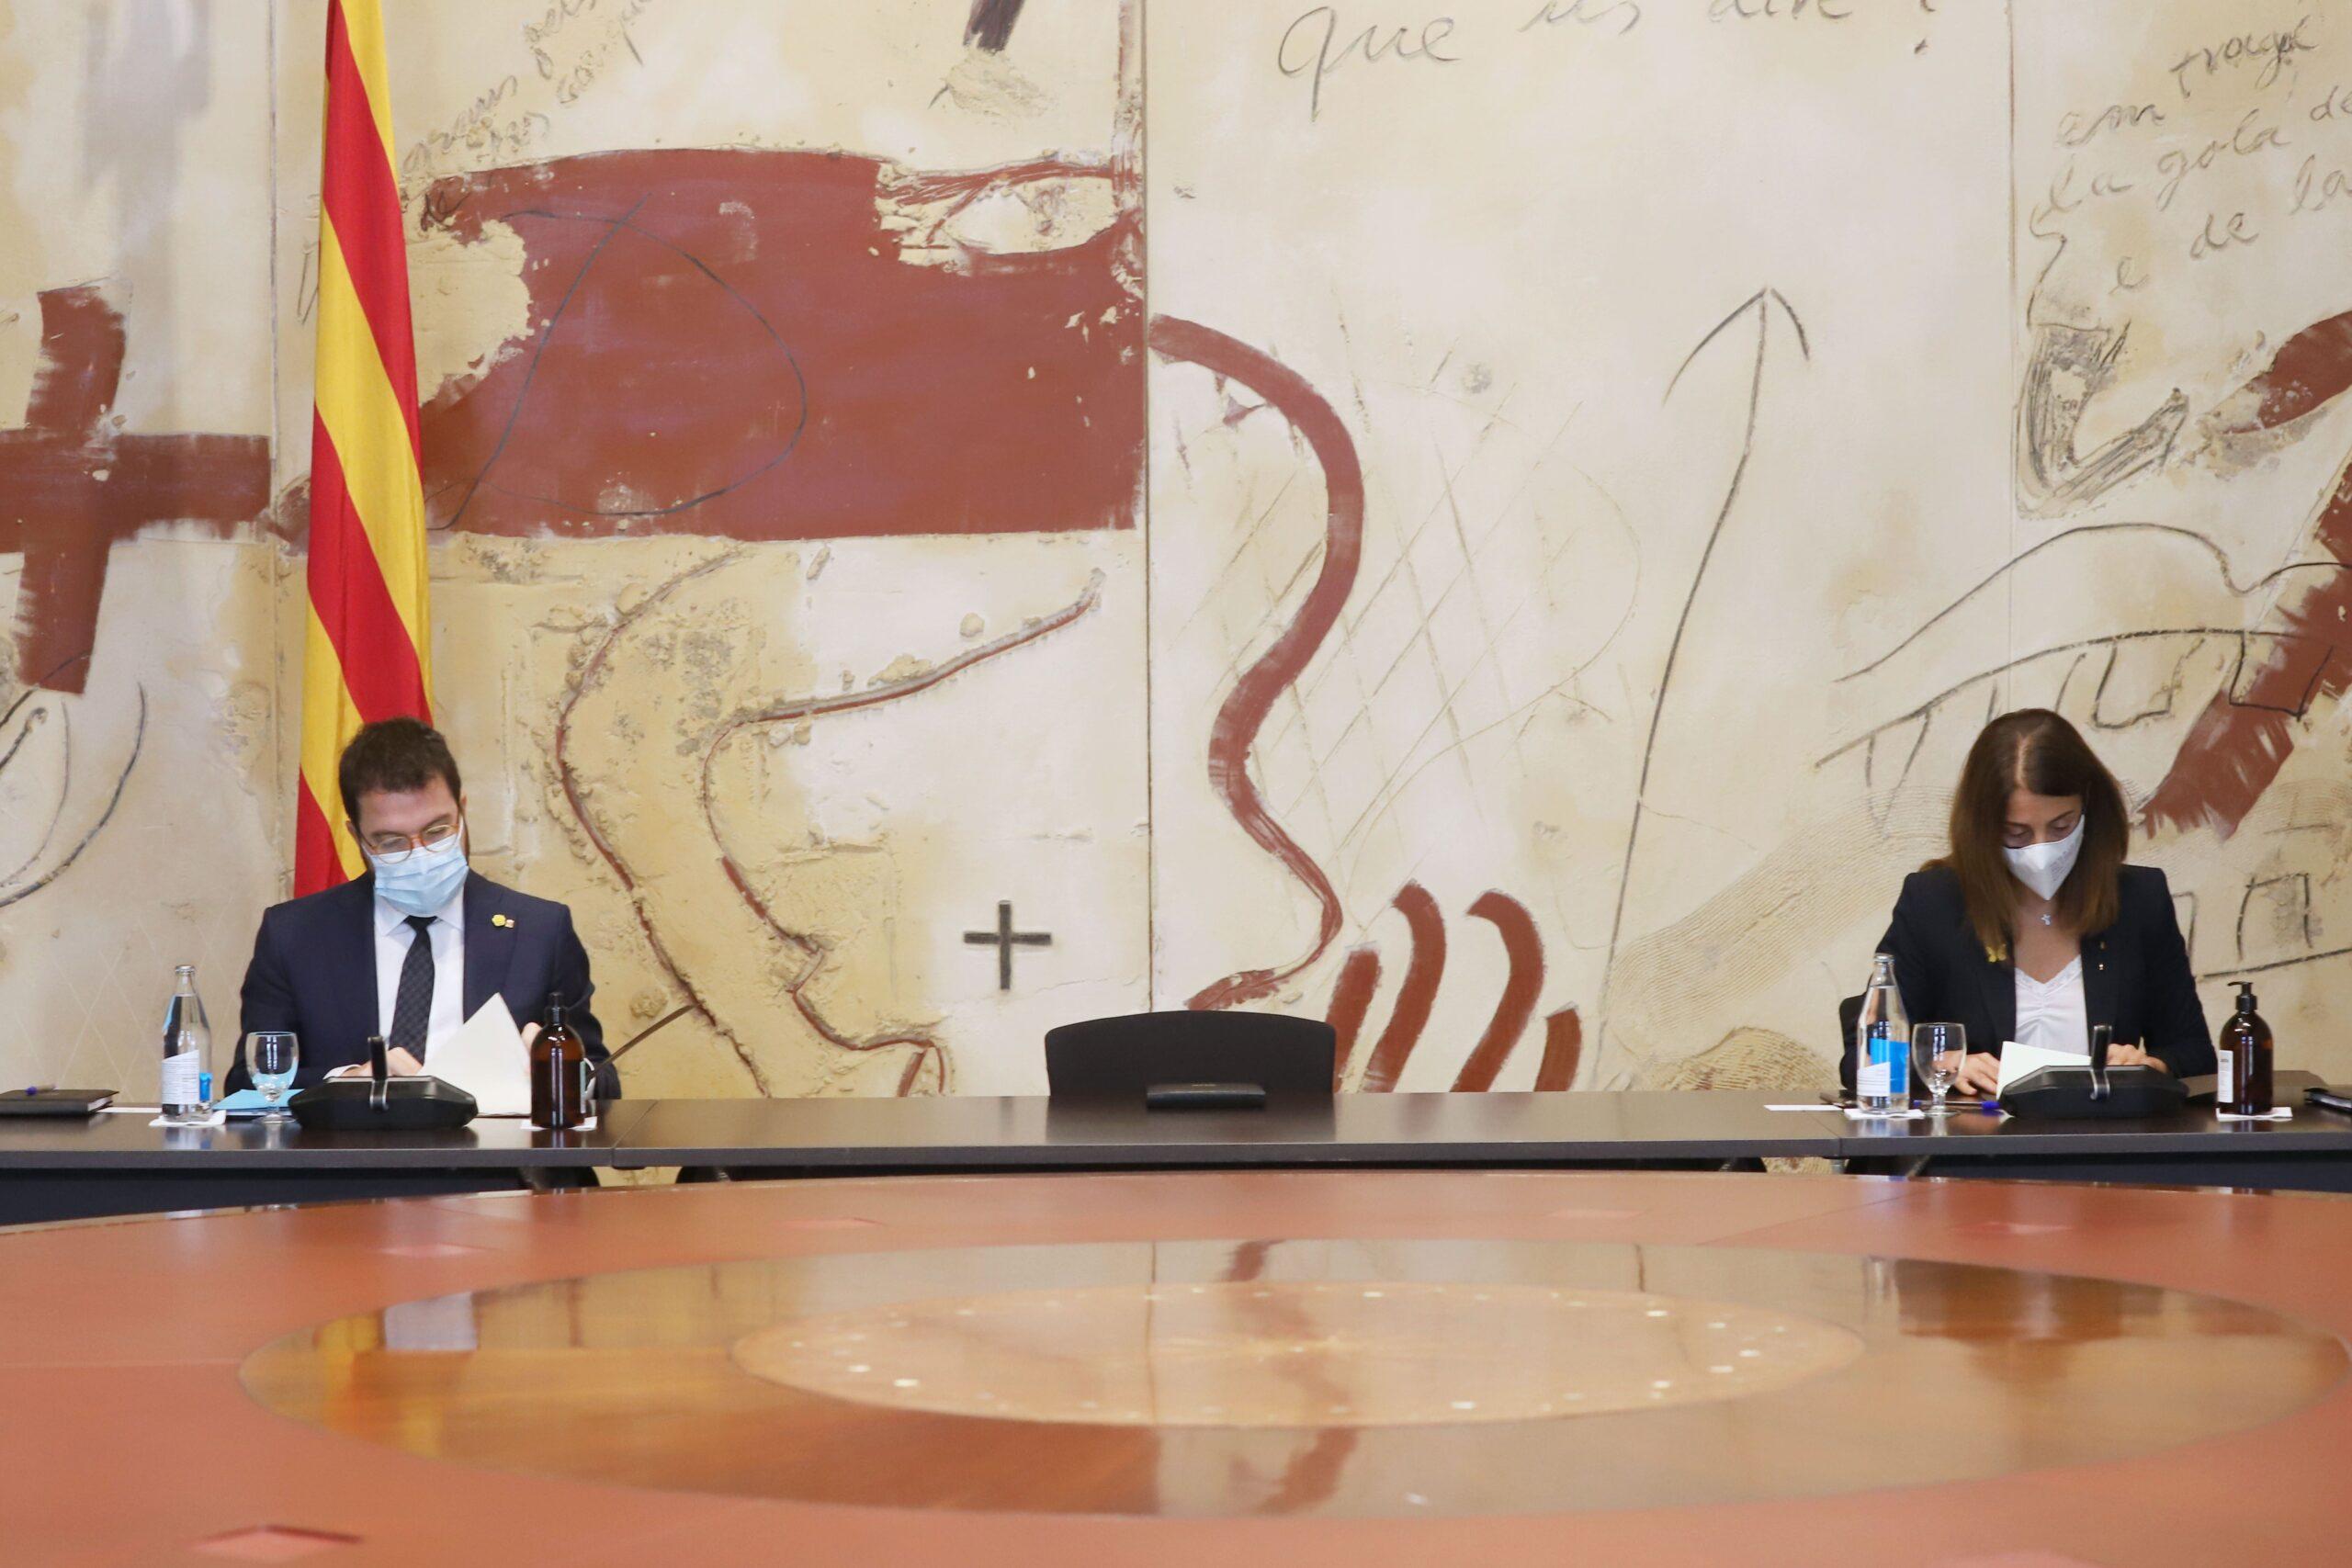 Pere Aragonès i Meritxell Budó / Govern